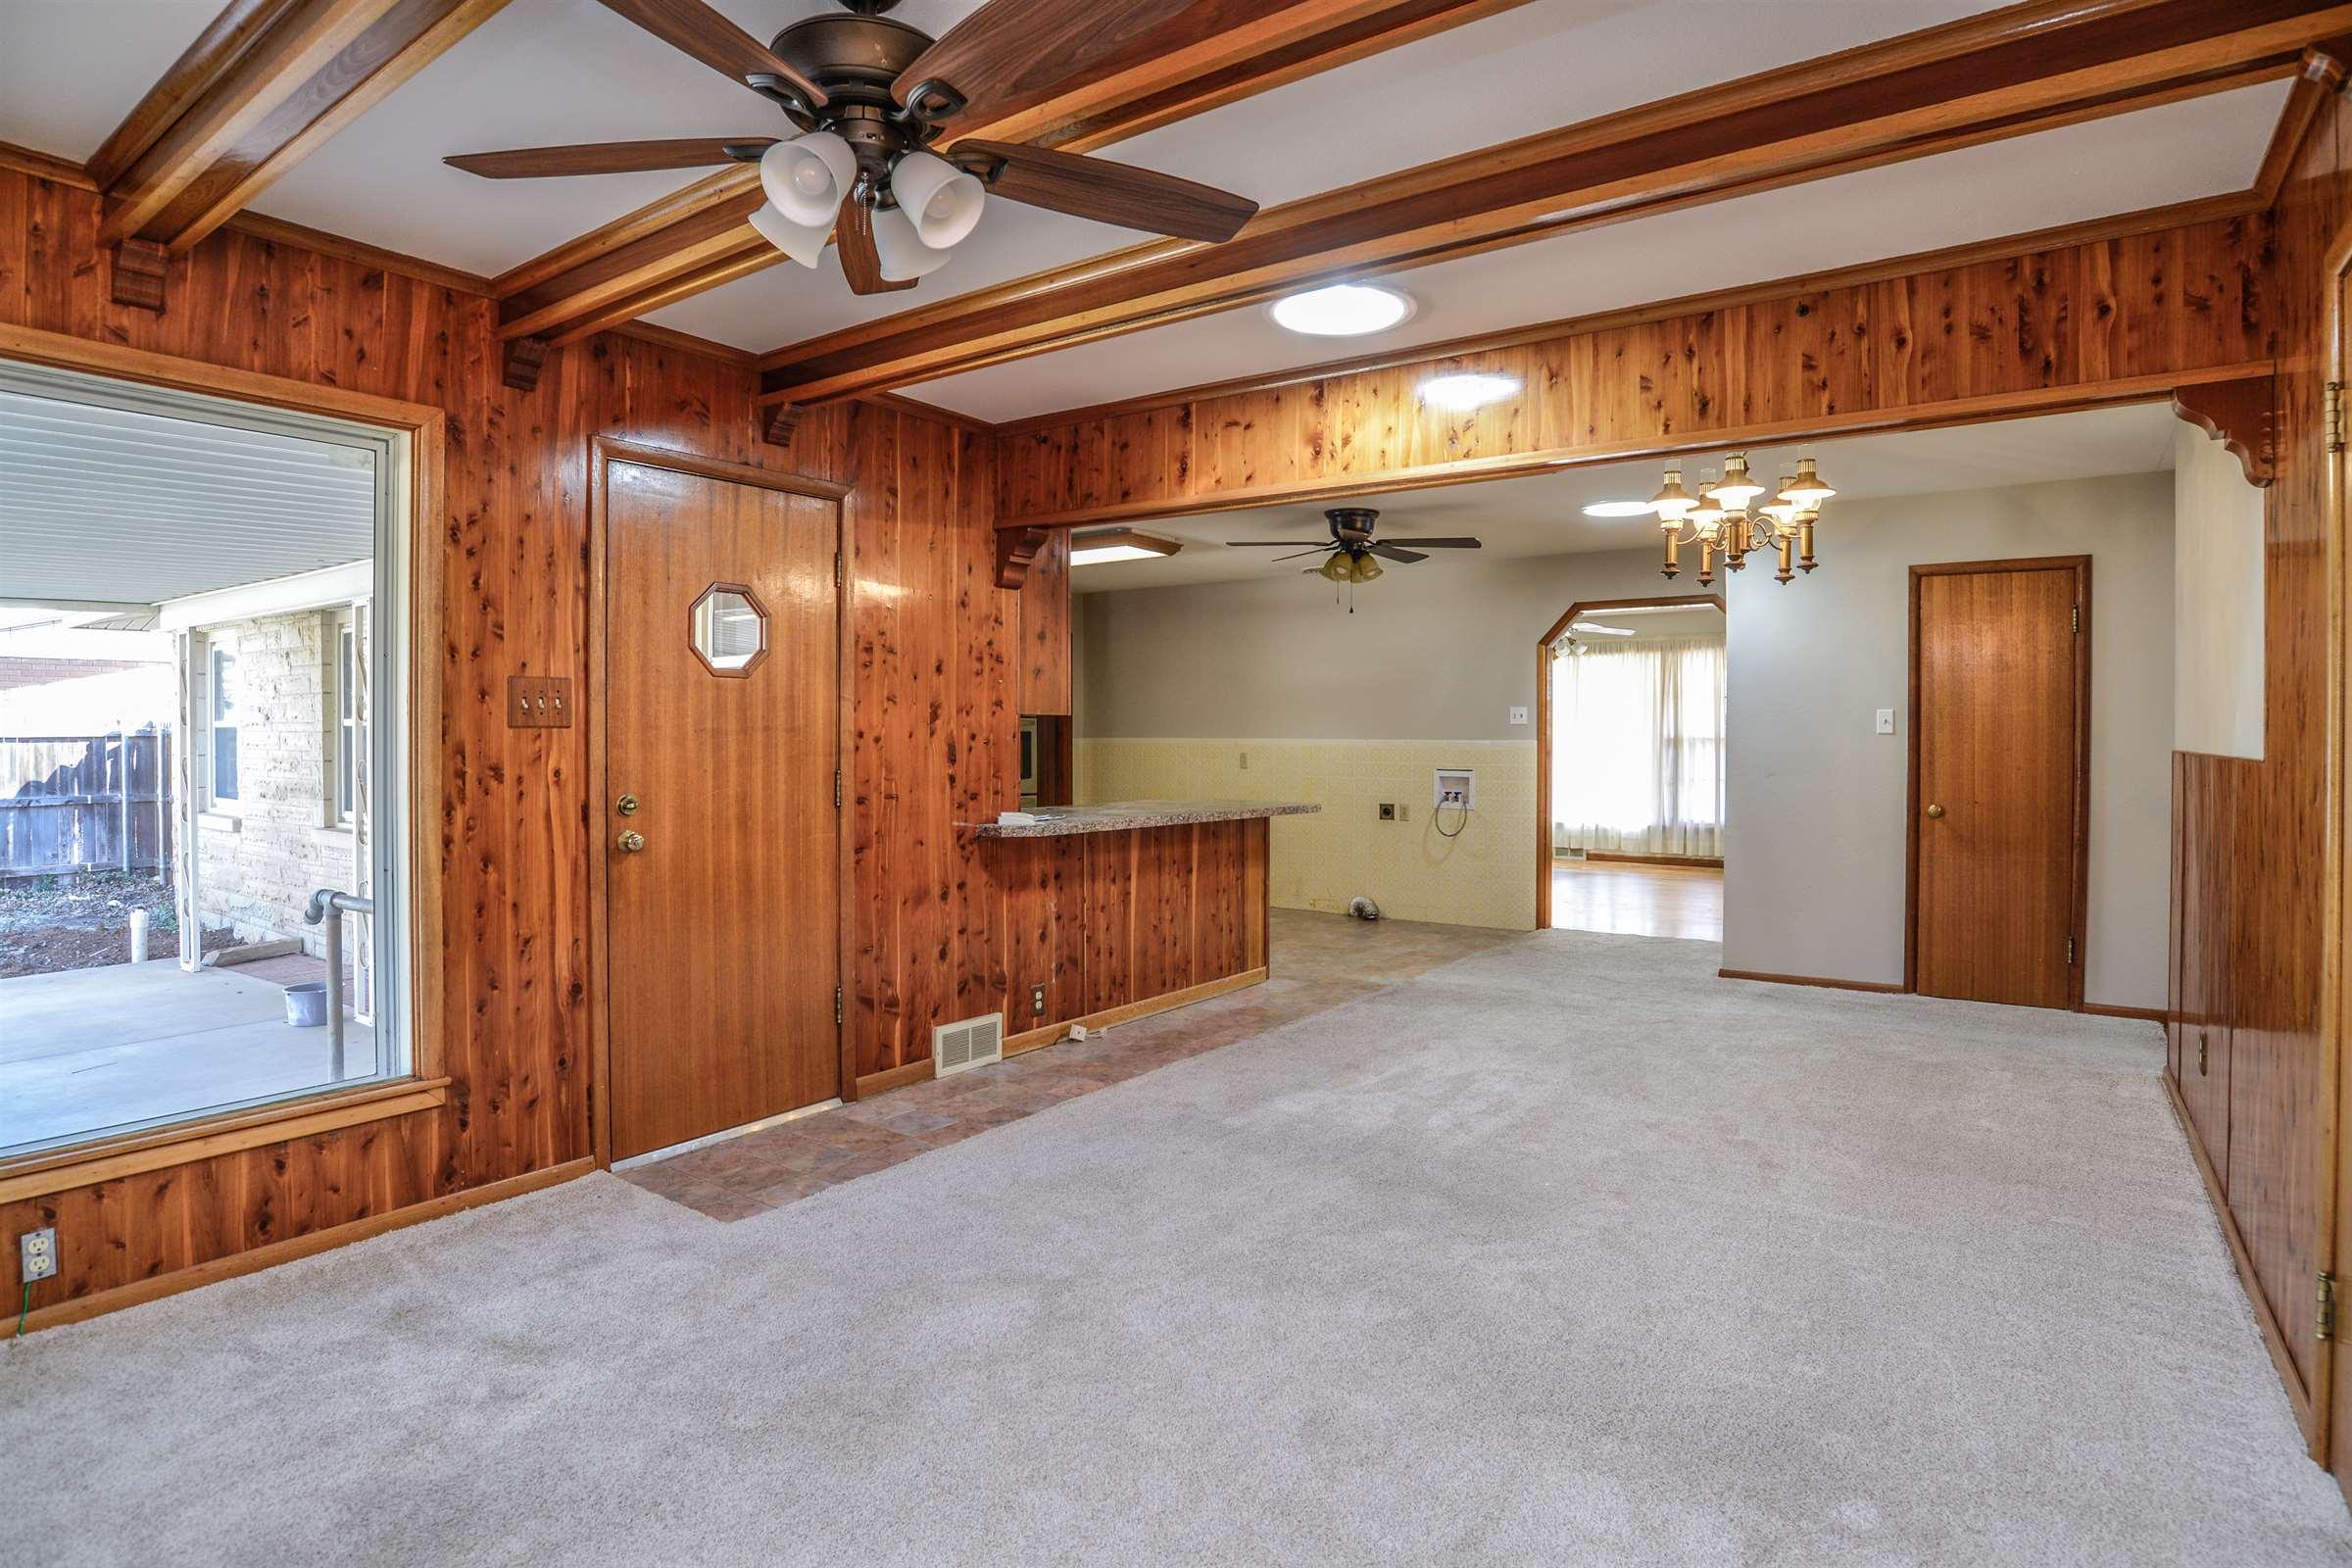 3414 43rd St, Lubbock, TX 79413